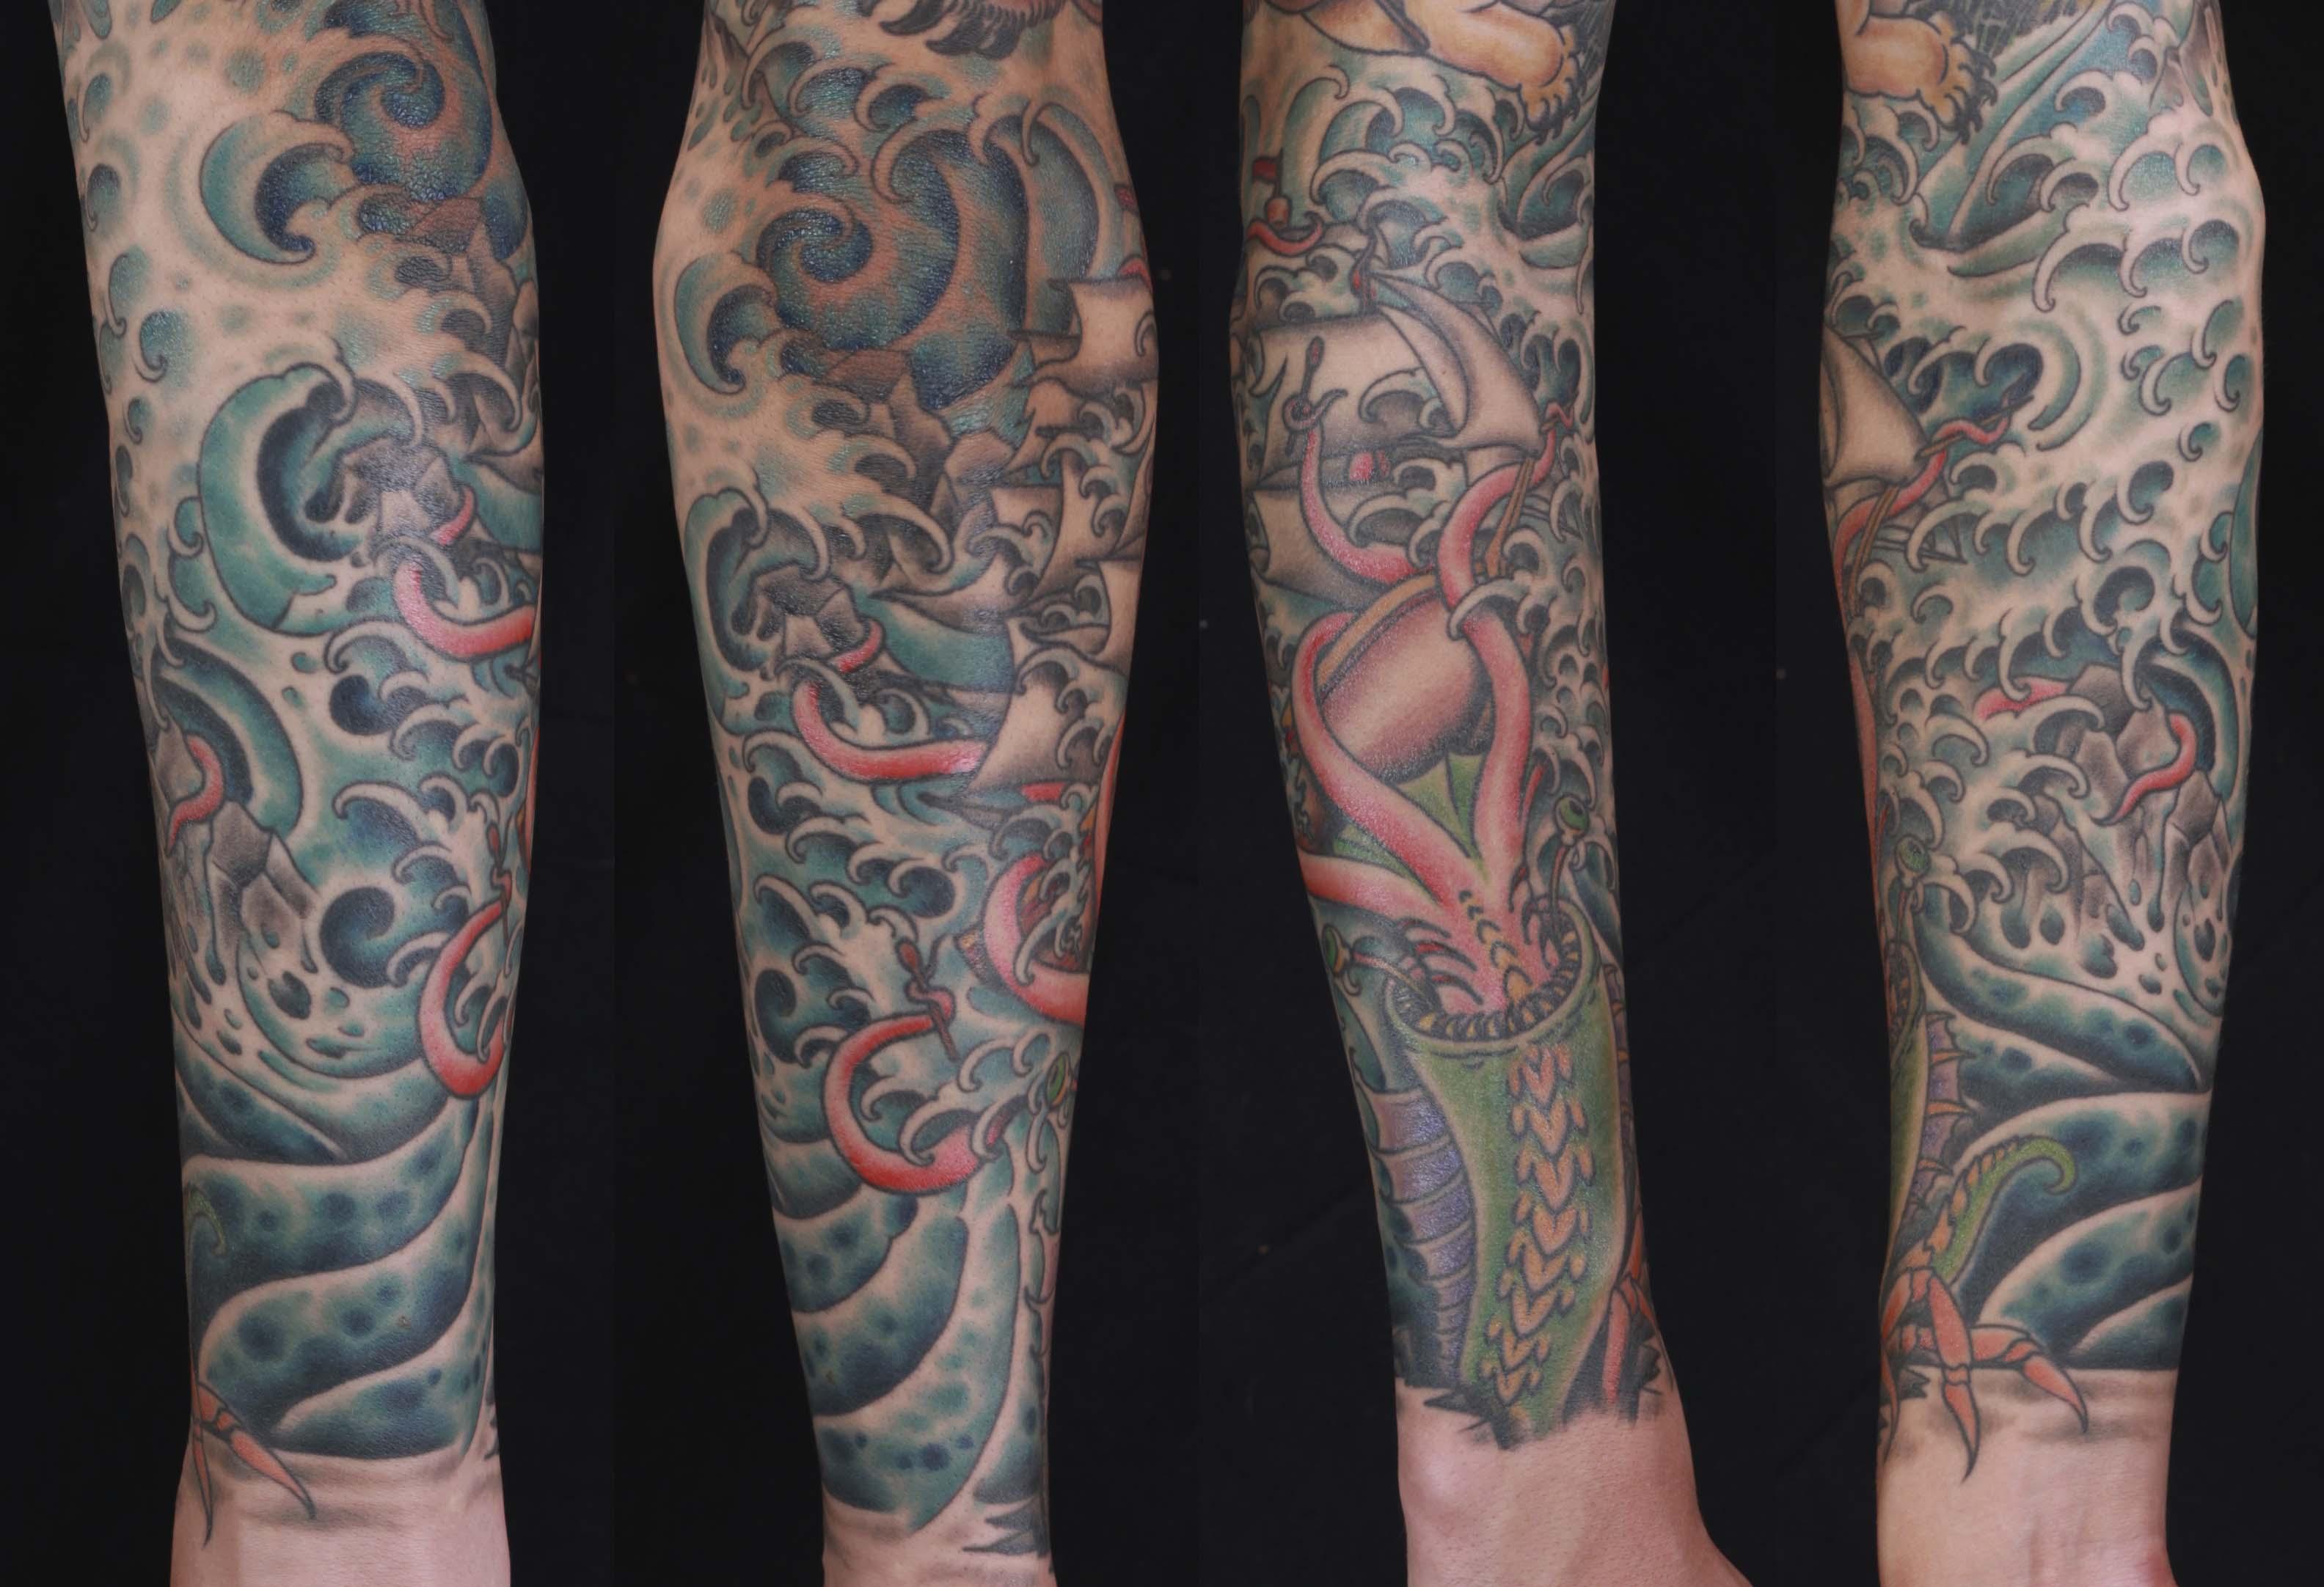 brian-thurow-dedication-tattoo-squid-ship-water-waves-forearm